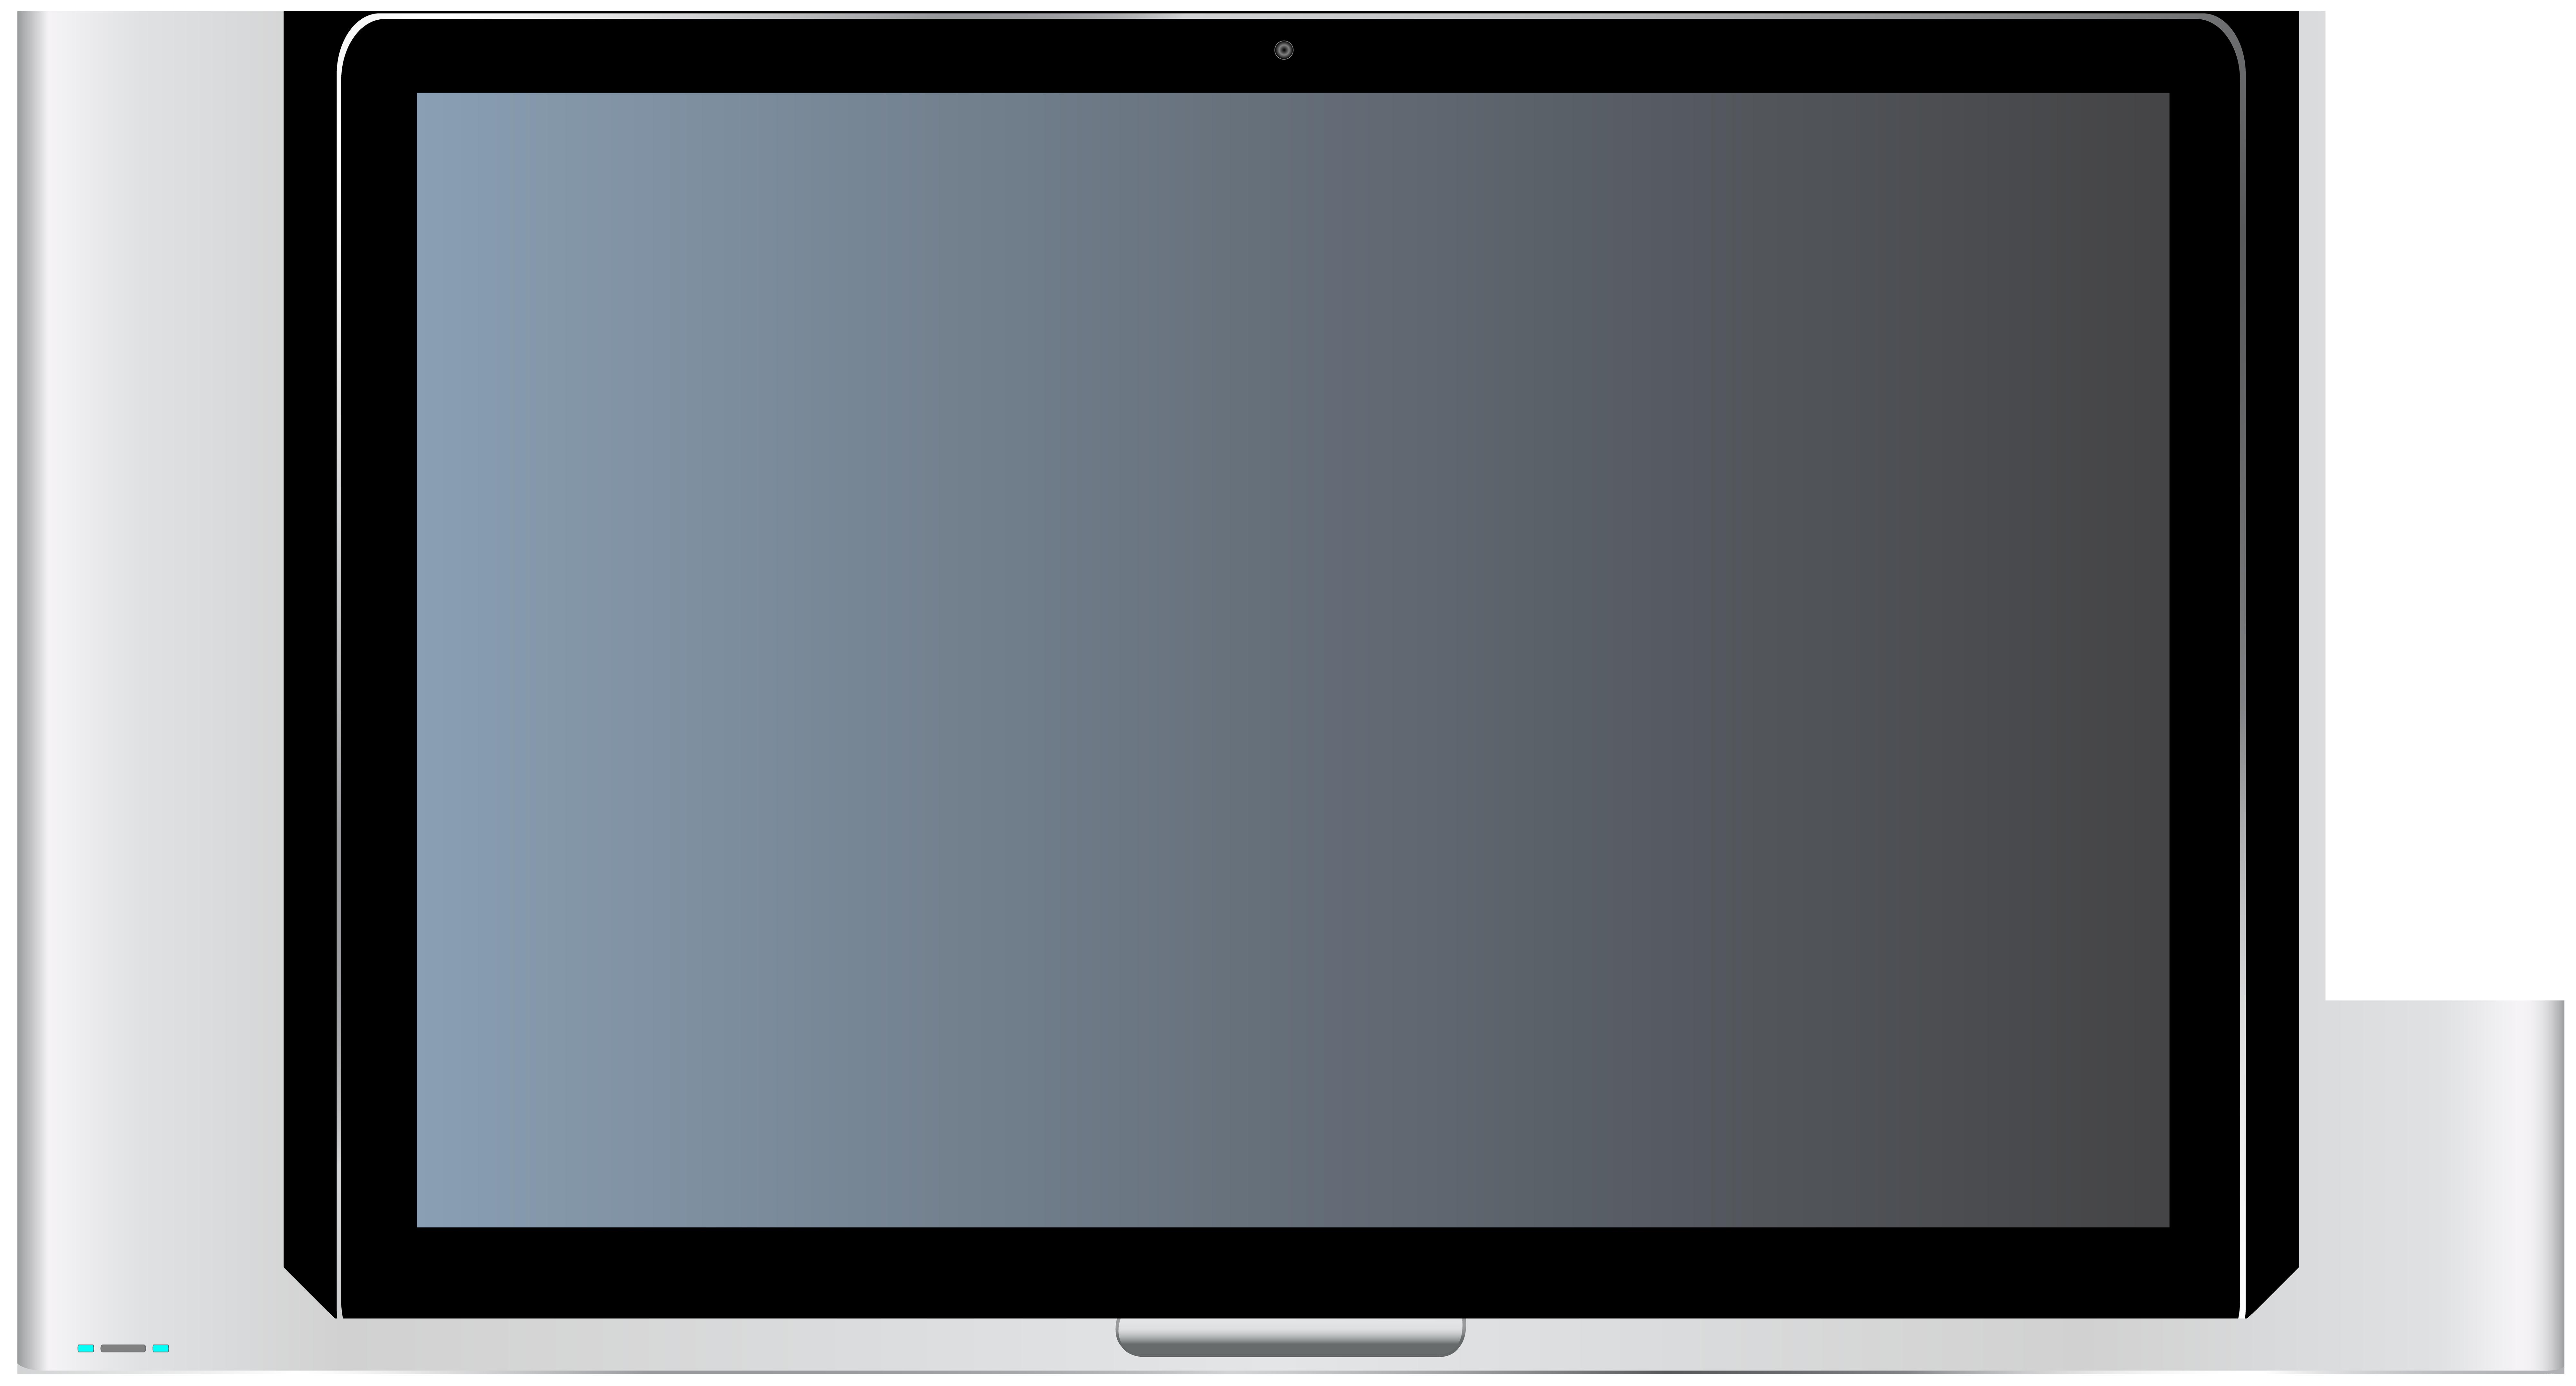 8000x4303 Laptop Transparent Png Clip Artu200b Gallery Yopriceville